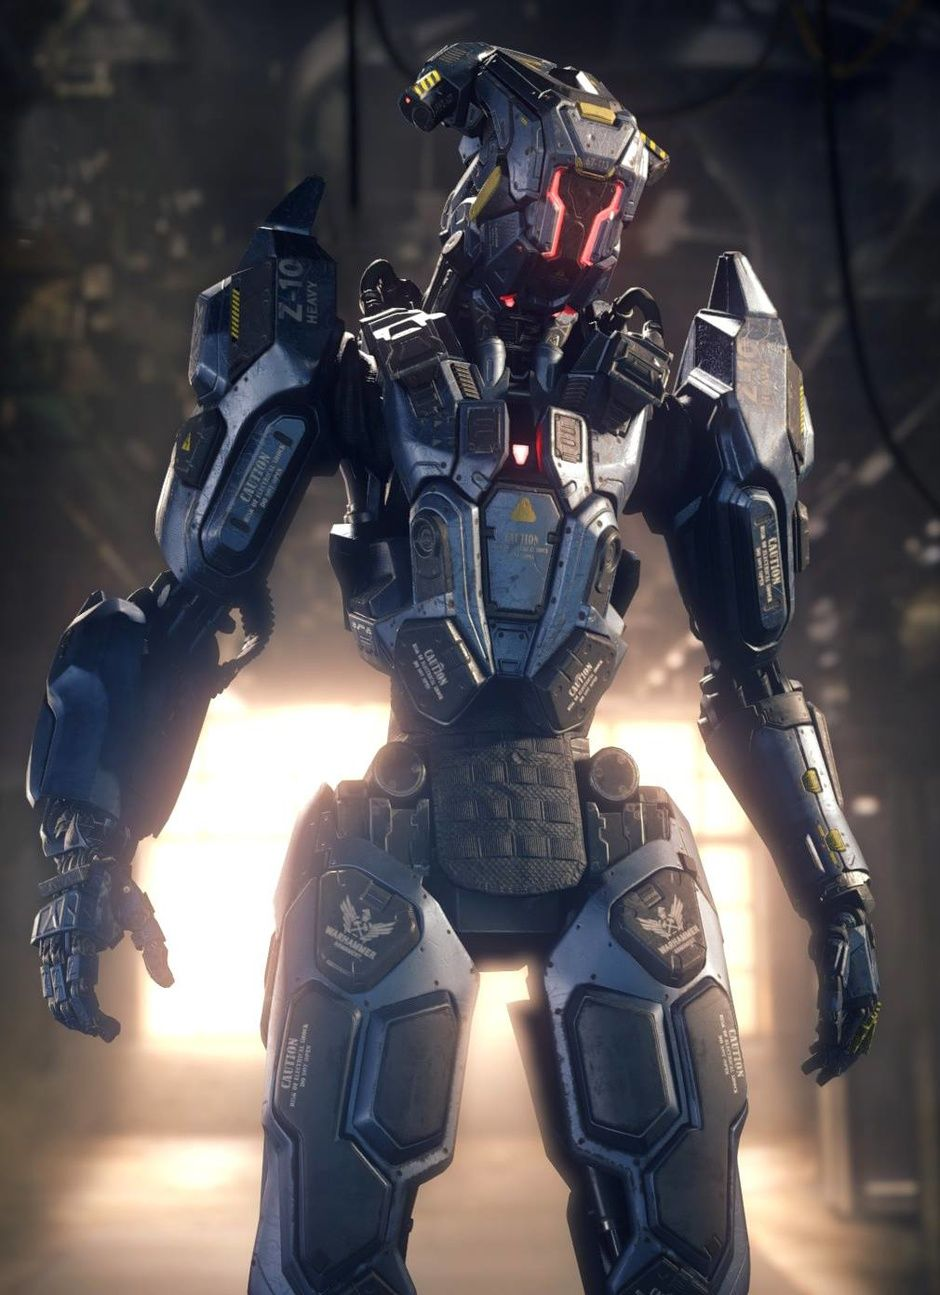 call of duty black ops 3 reaper variant 2peter zoppi   robotic